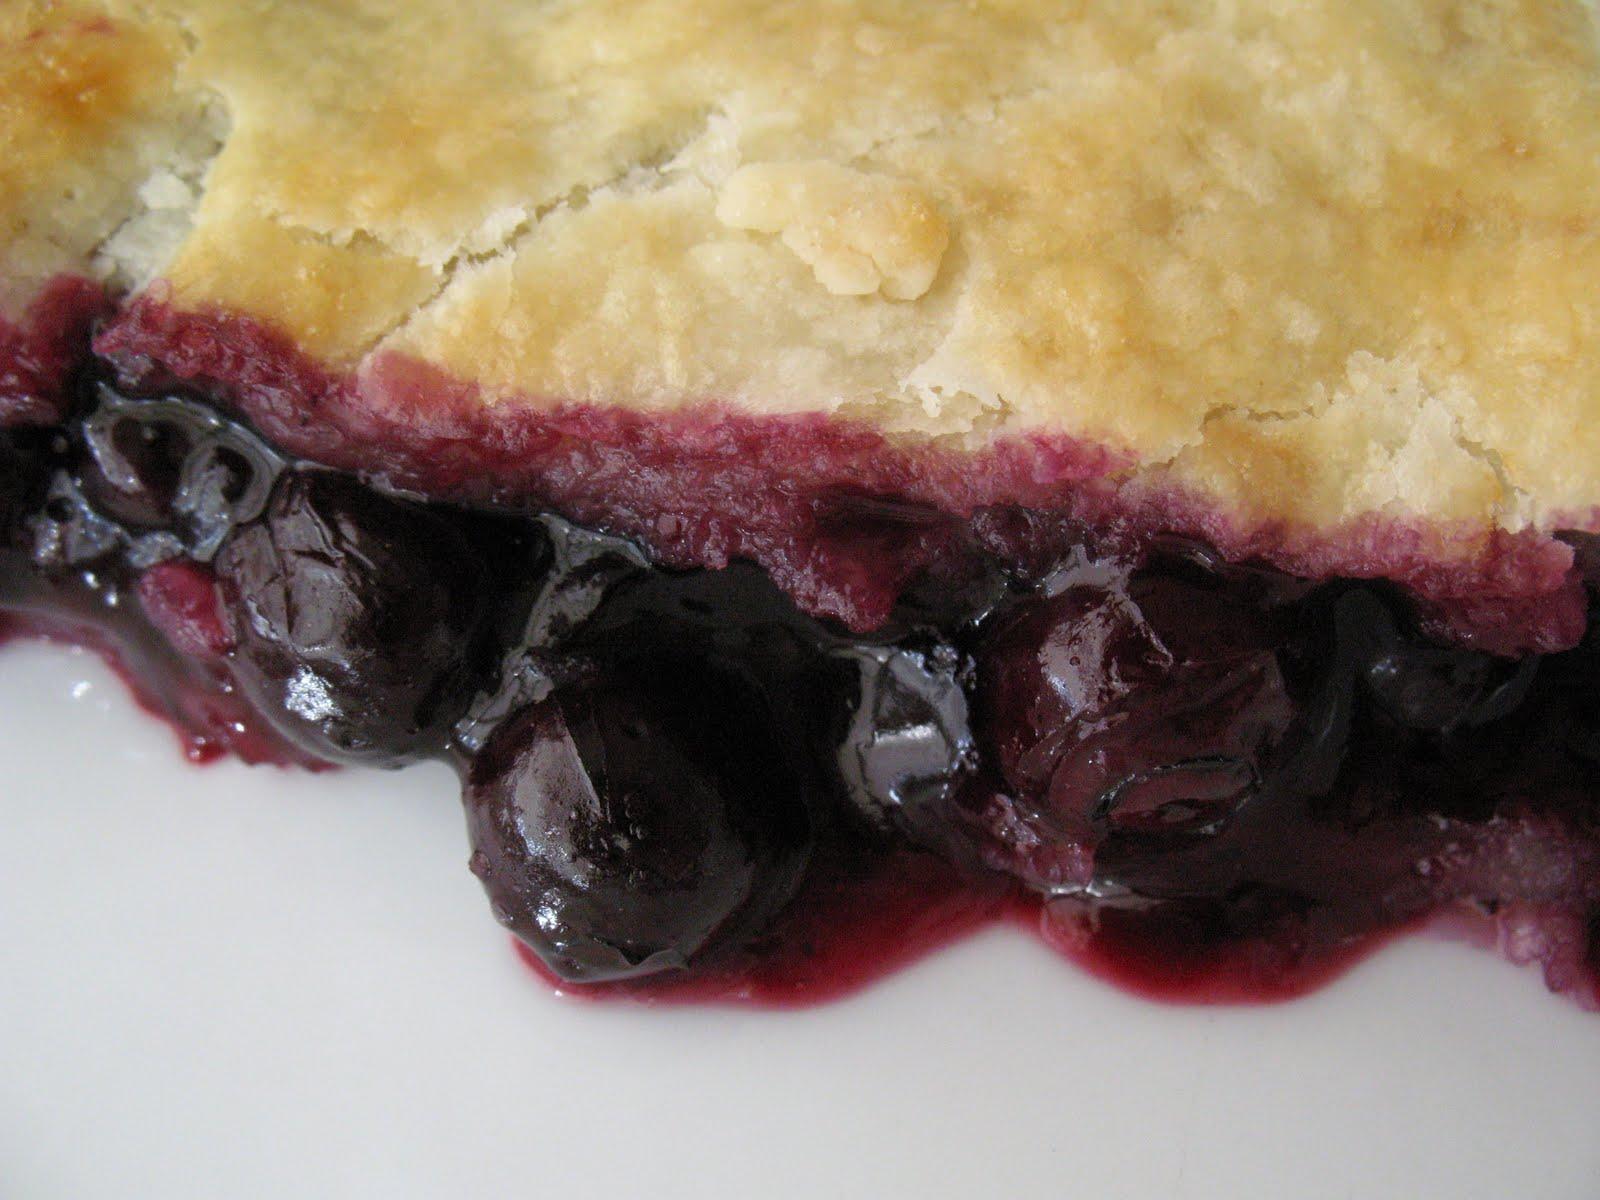 Food Processor Pie Pastry - Pie Crust Recipe